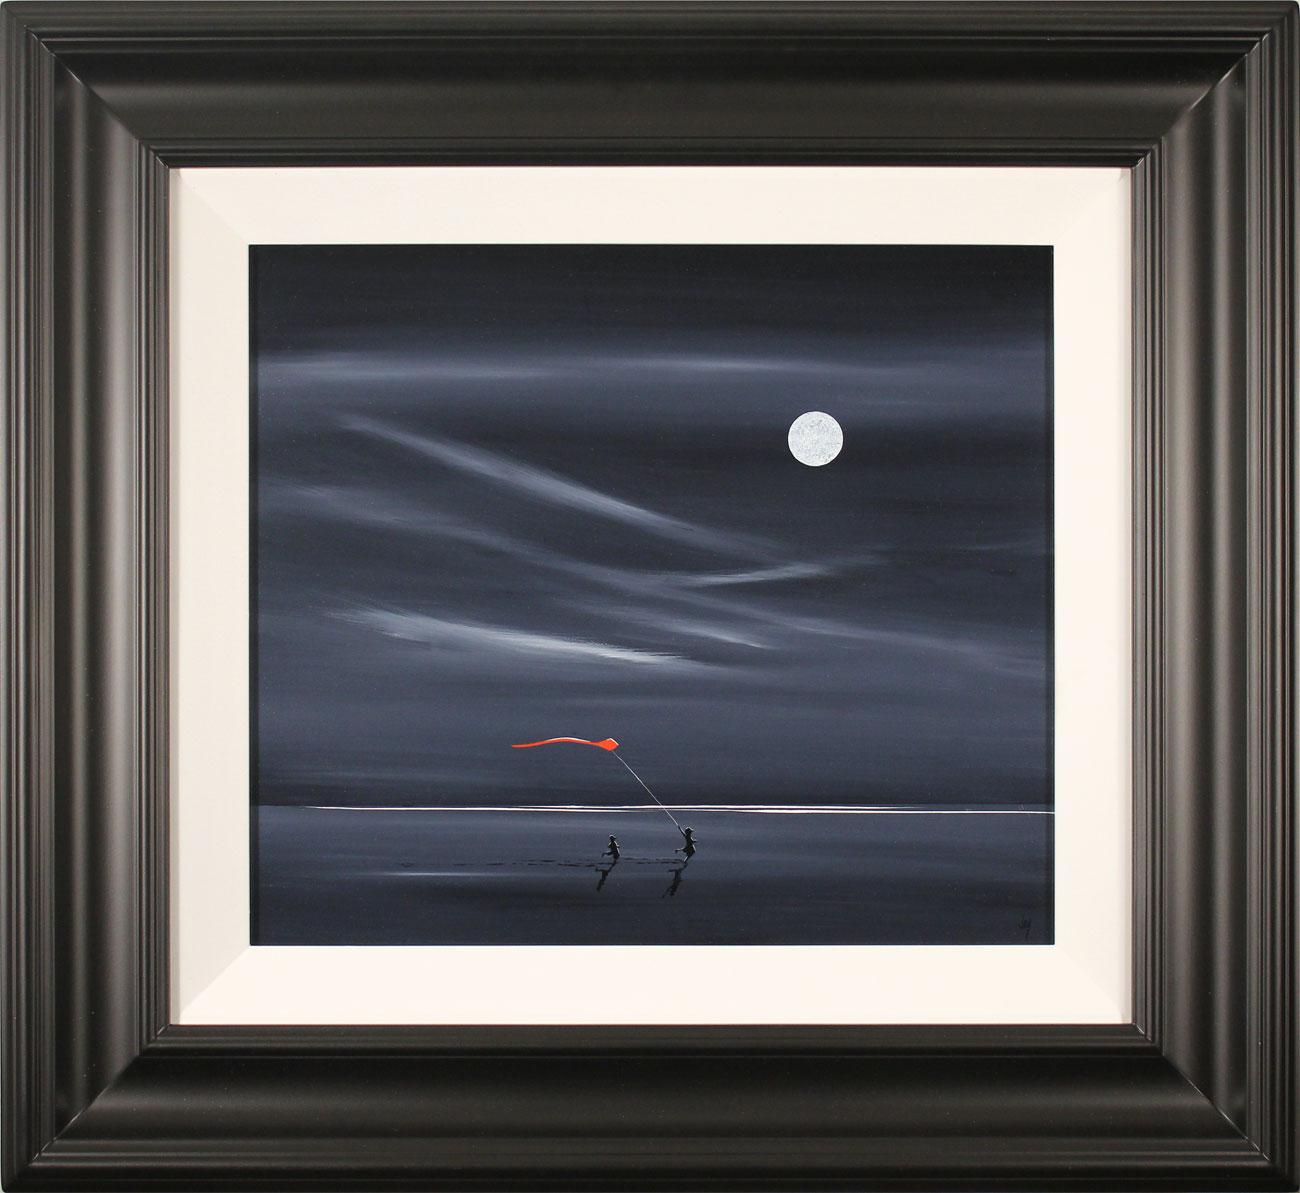 Jay Nottingham, Original oil painting on panel, Midnight Kite, click to enlarge